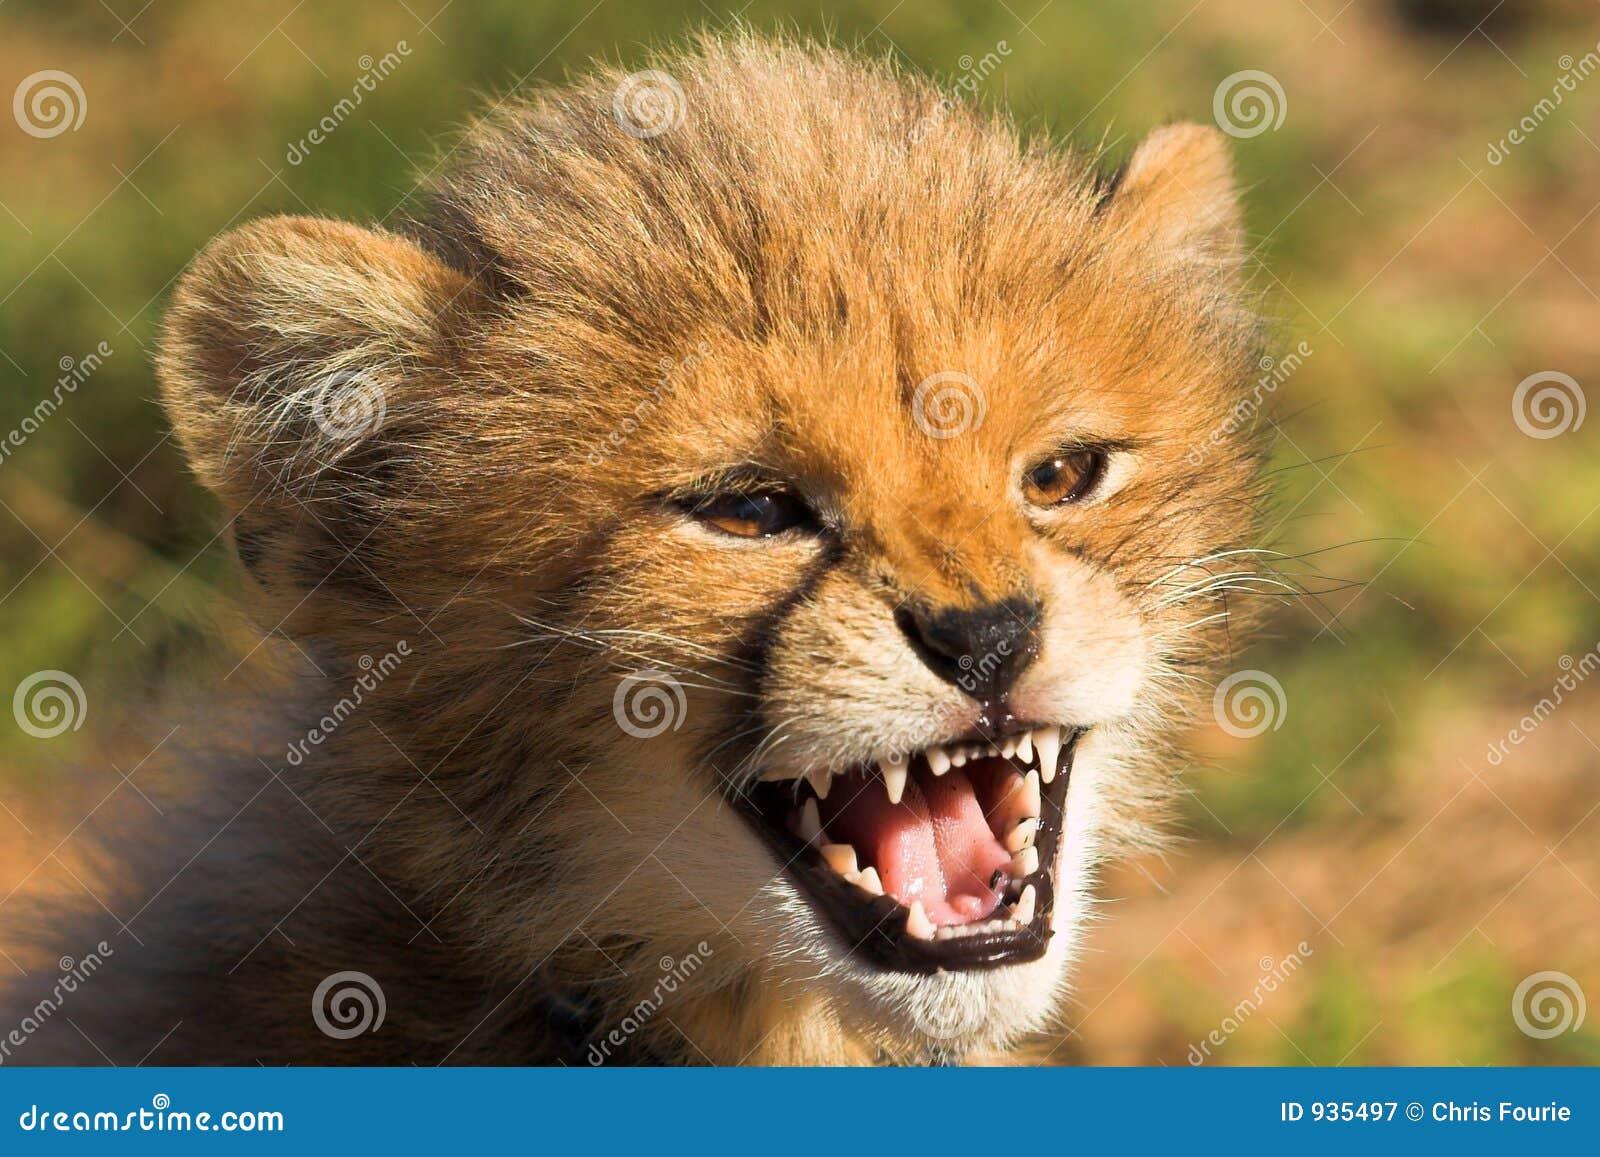 angry baby cheetah - photo #9